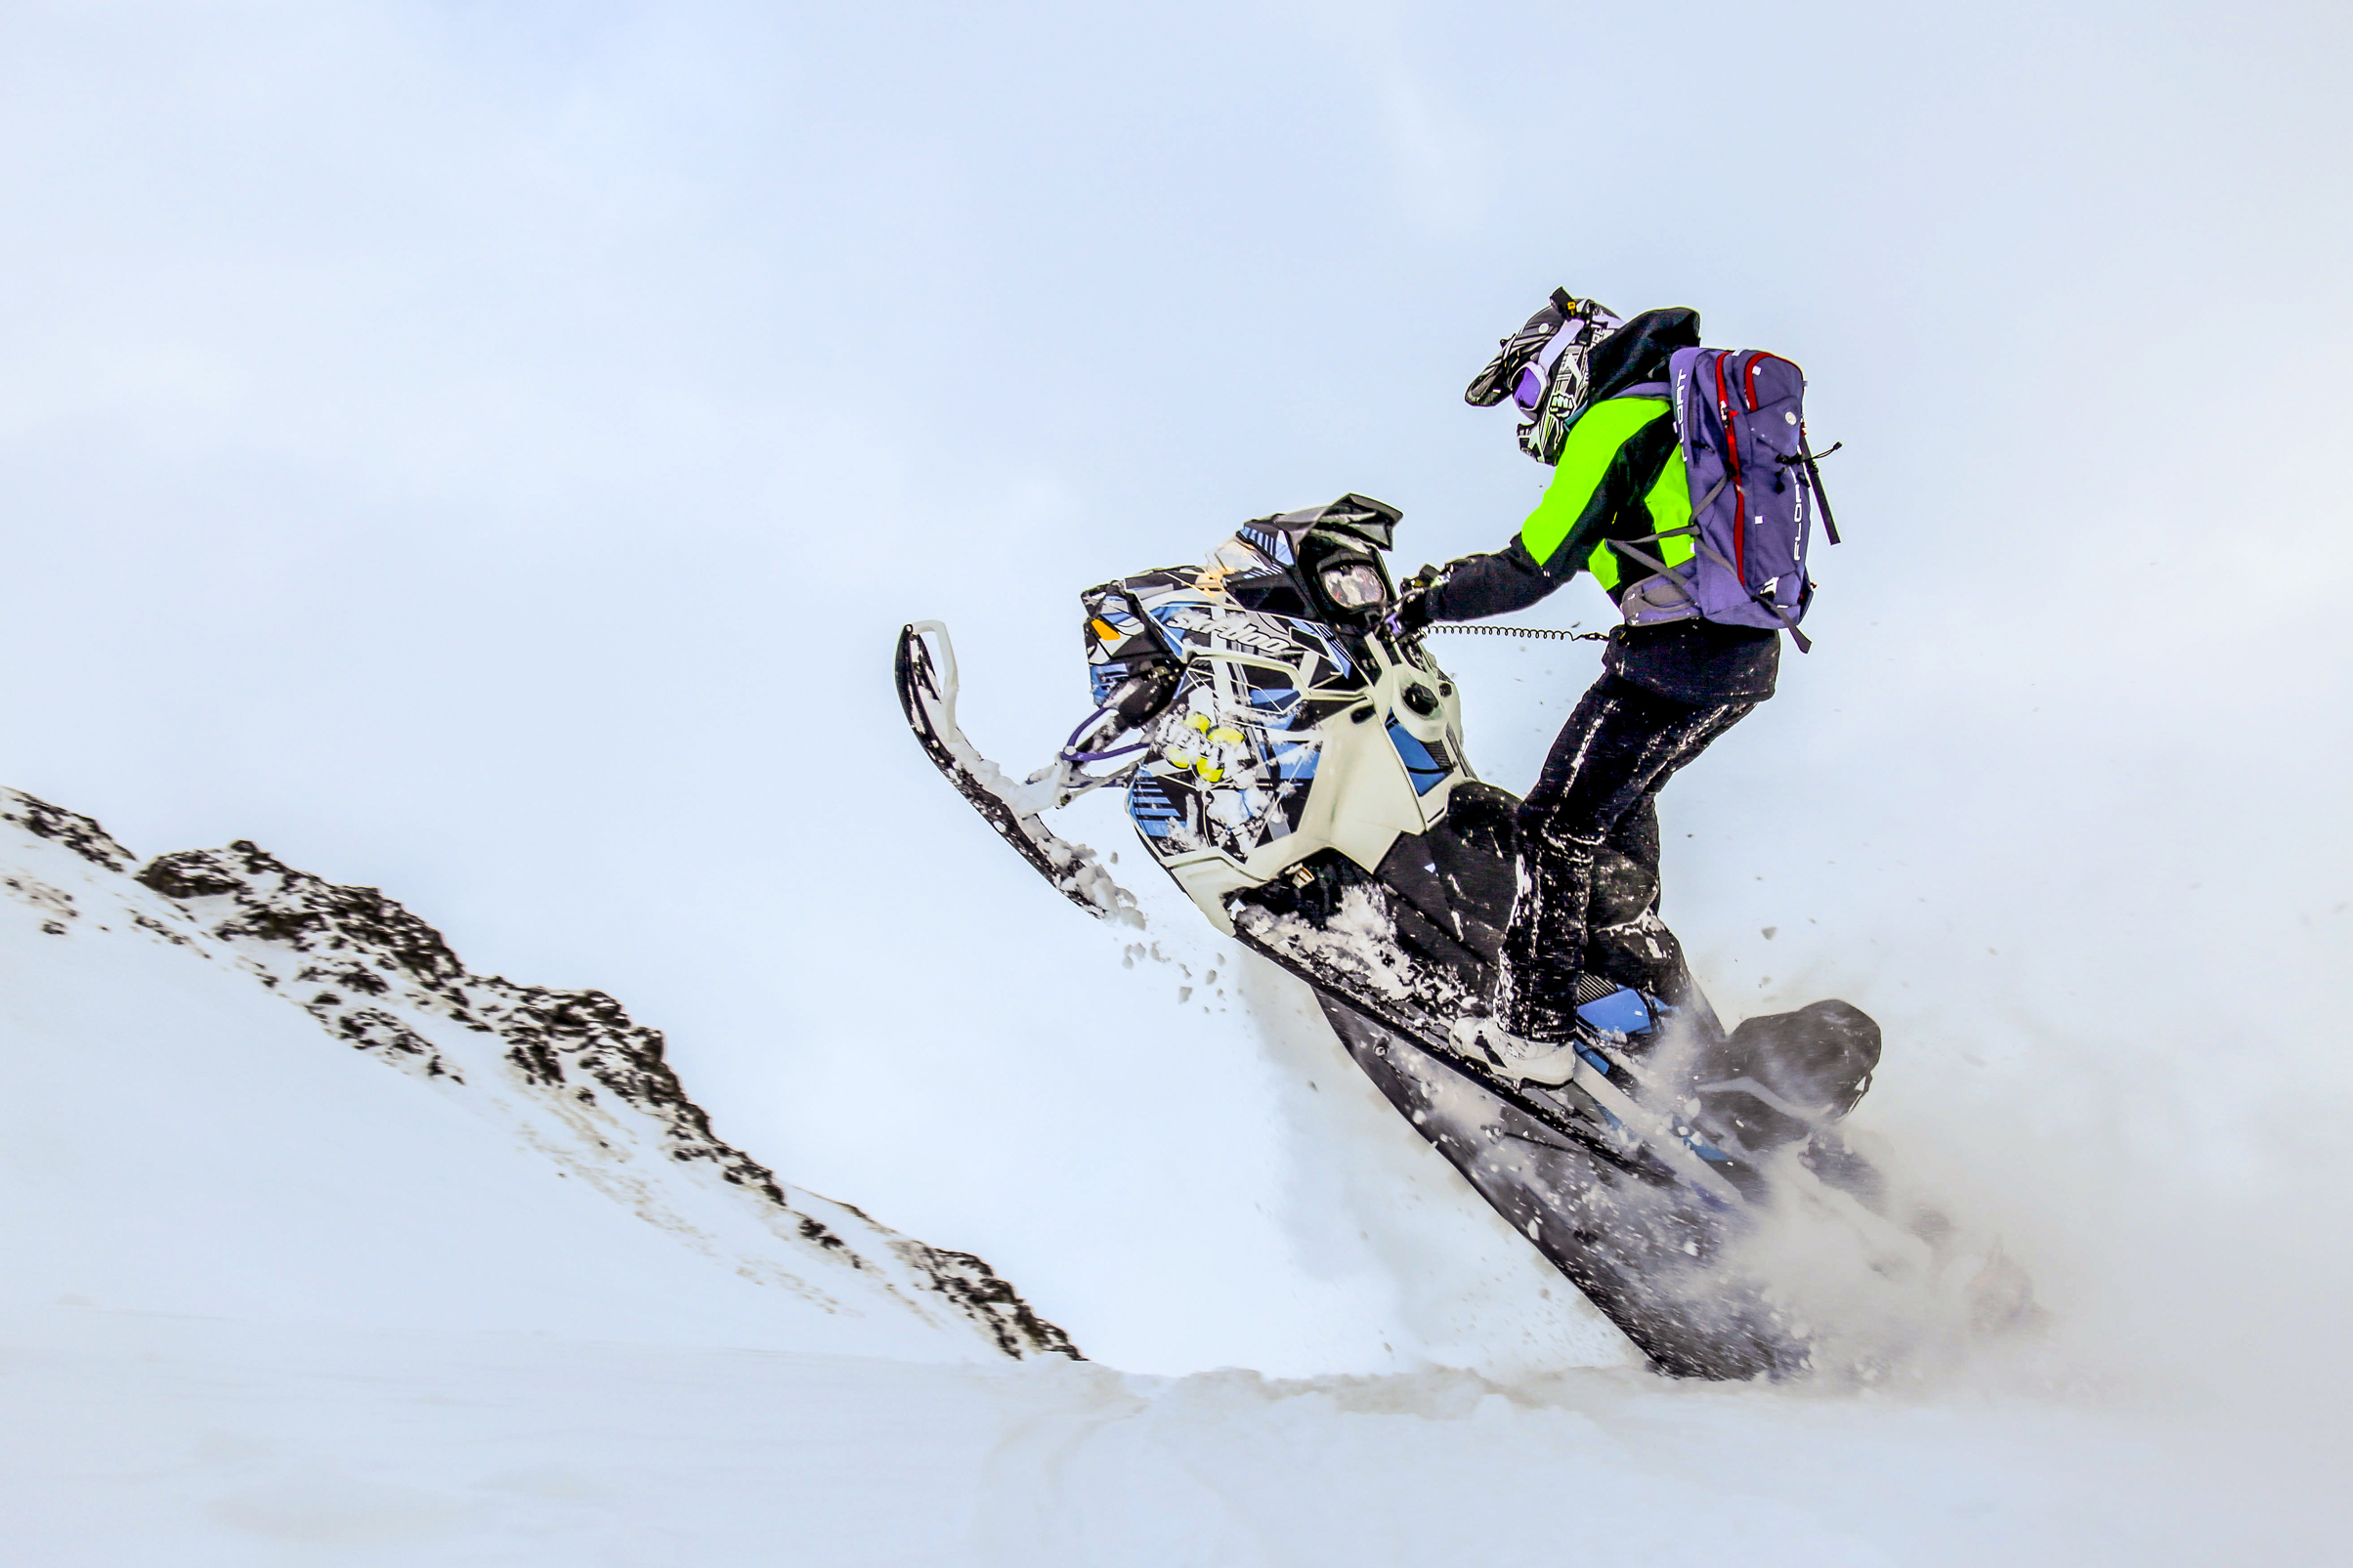 Snowmobile Mountains Suspension